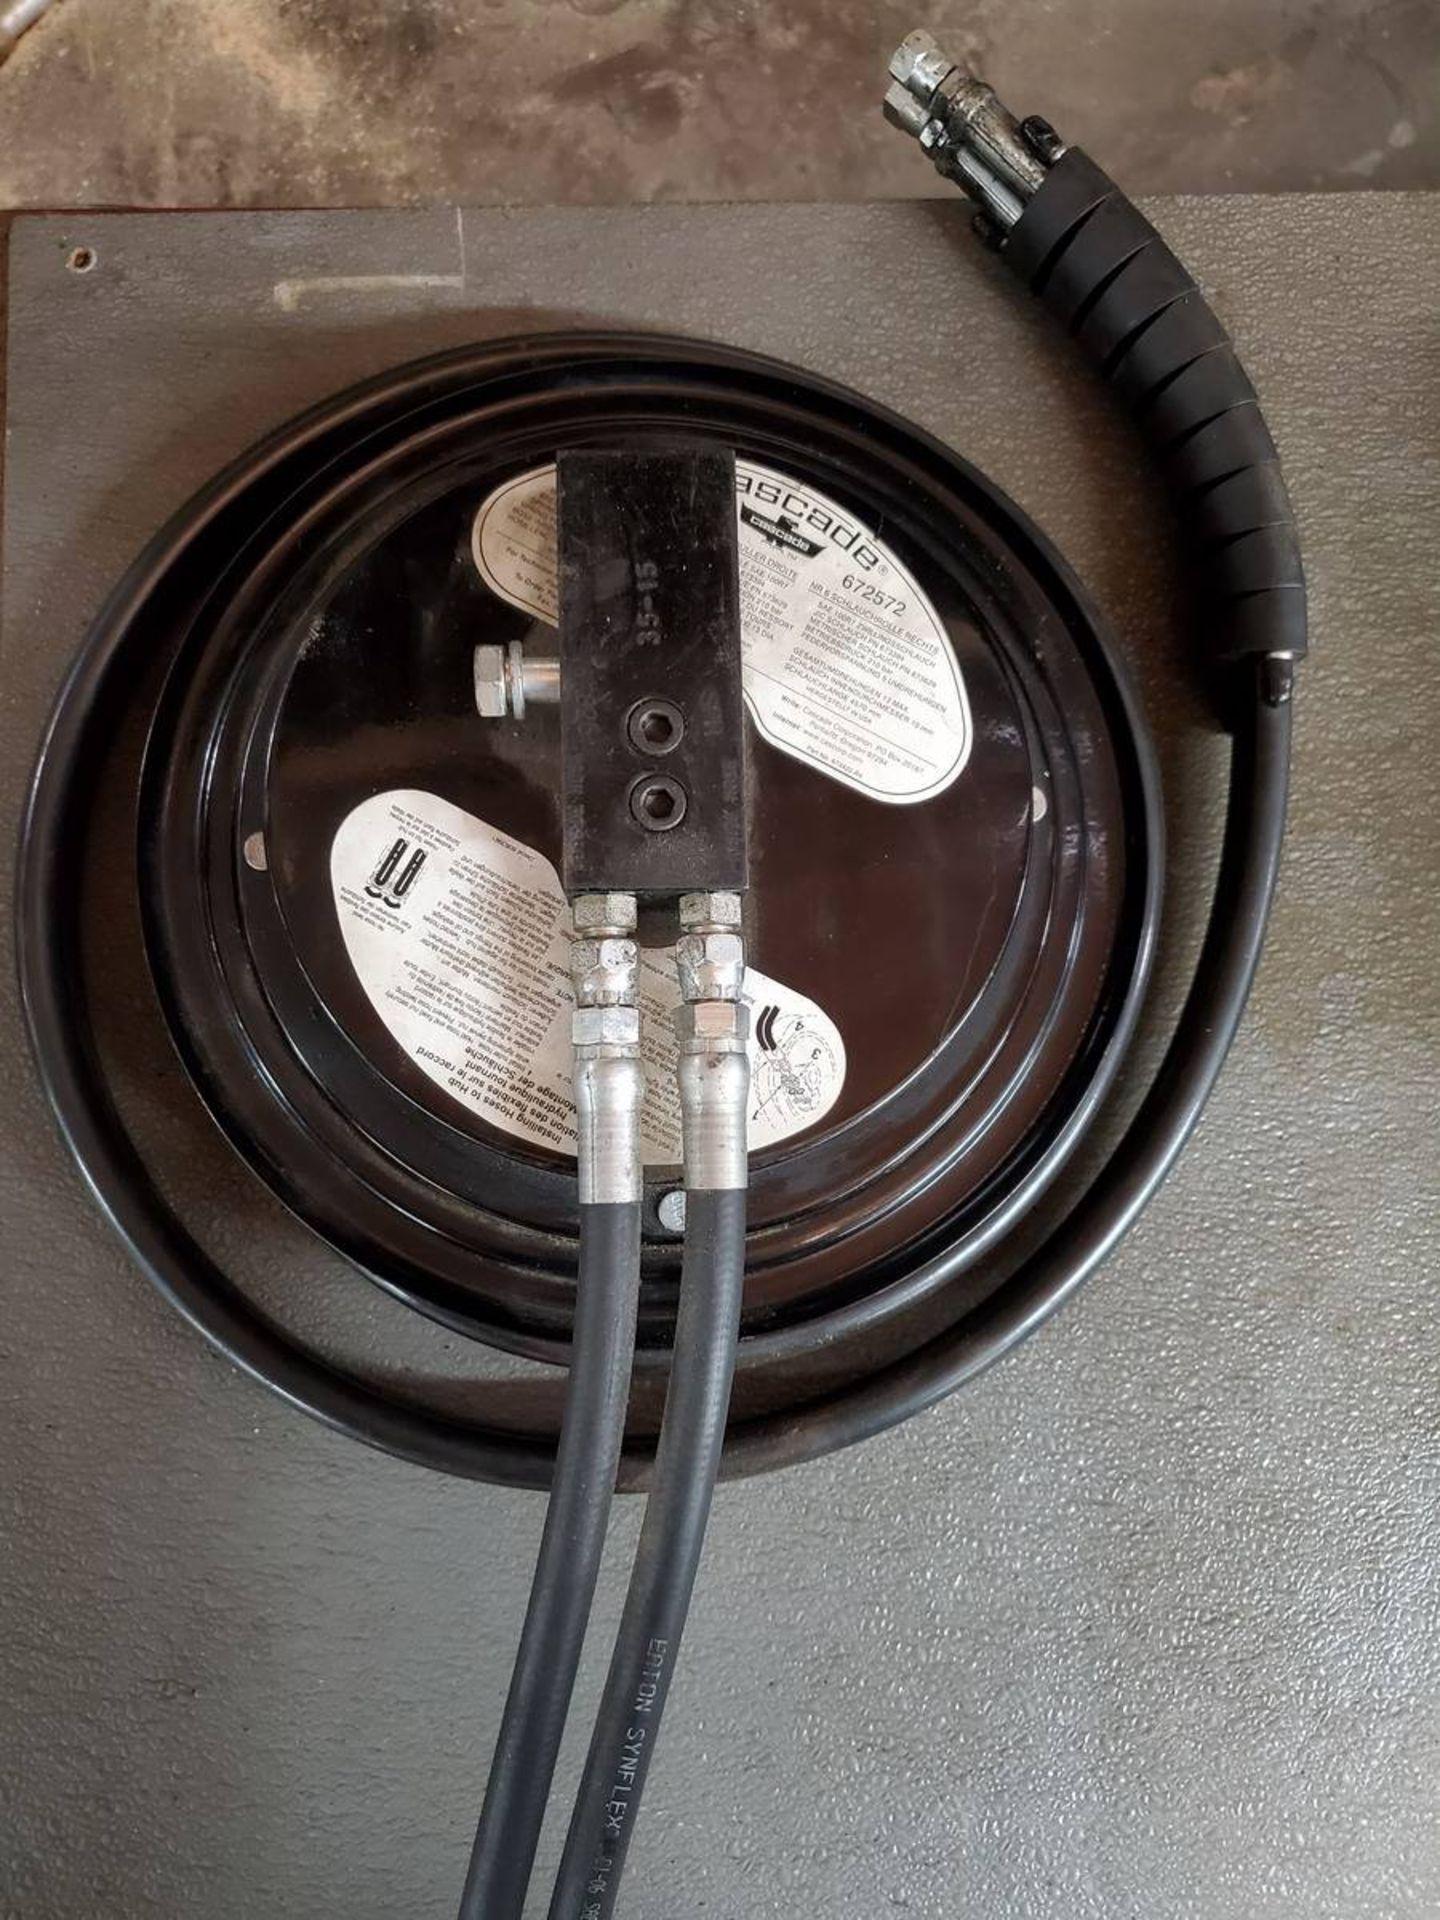 Lot 69 - Cascade Forklift Hydraulic Hose Reel